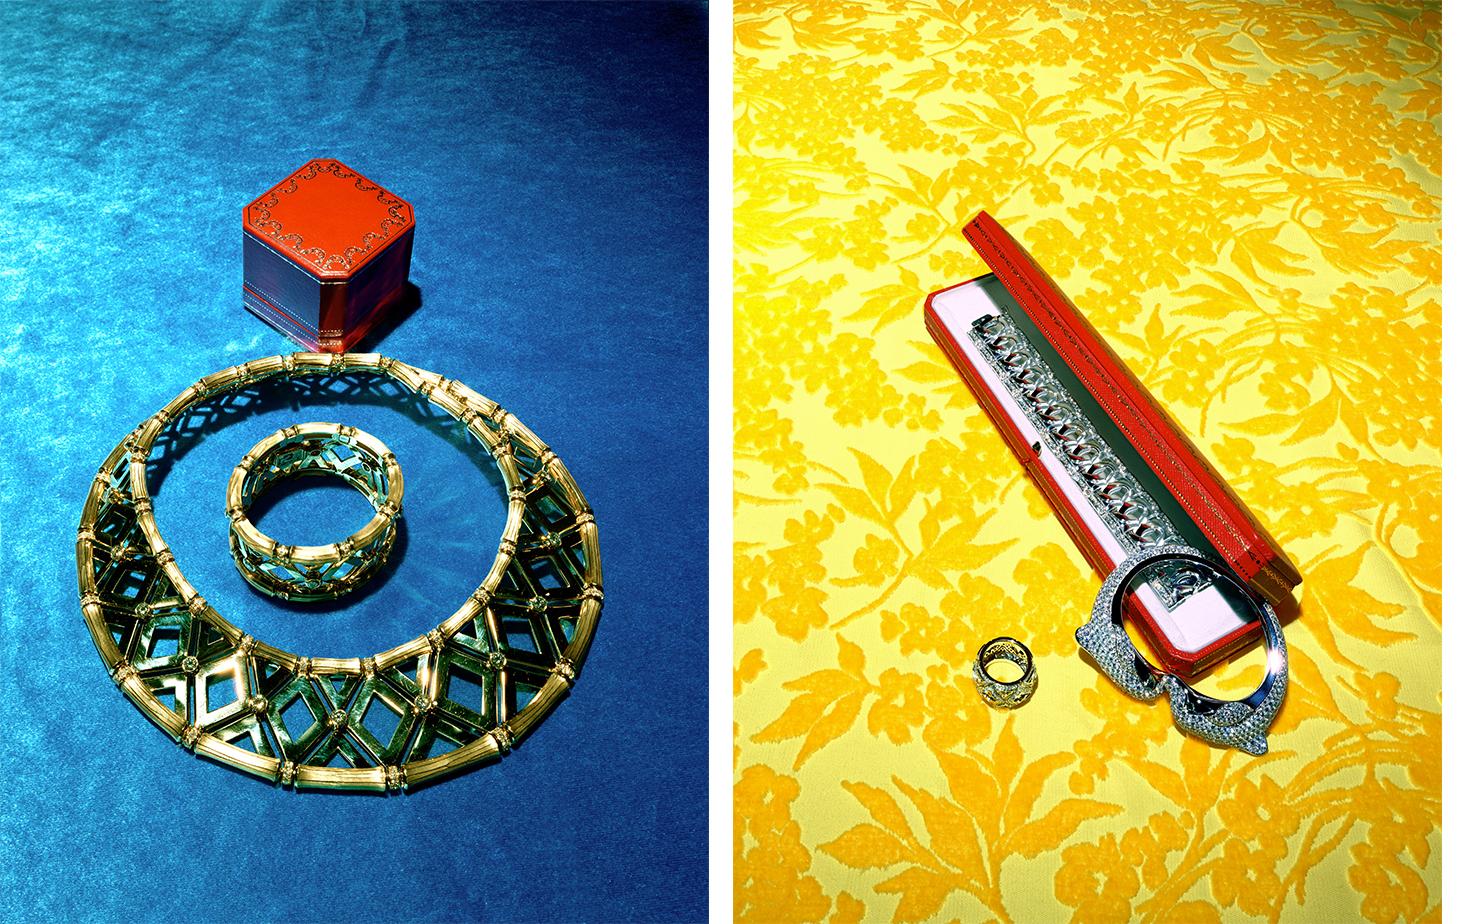 Harper's Bazaar INSIDE THE RED BOX   FASHION EDITOR Elissa Santisi CREATIVE DIRECTOR Fabien Baron